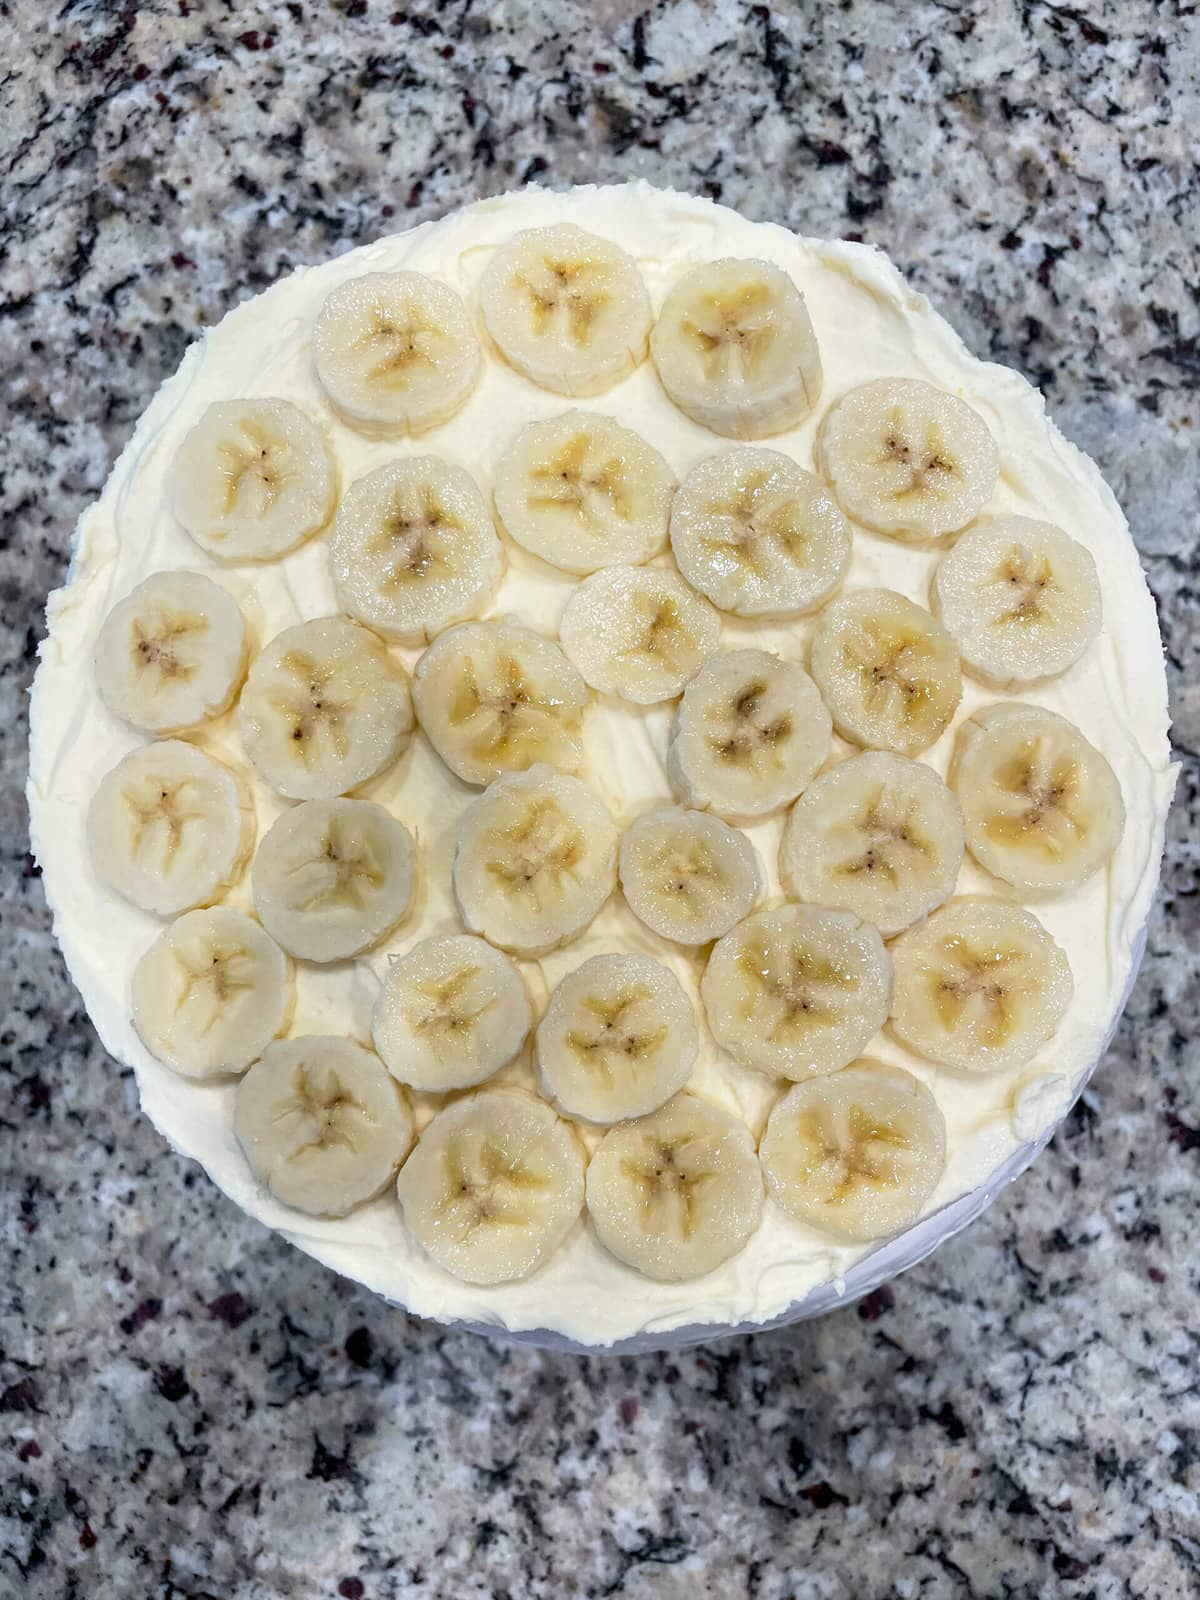 overhead shot of banana slice layer on top of banana icebox pie on granite countertop